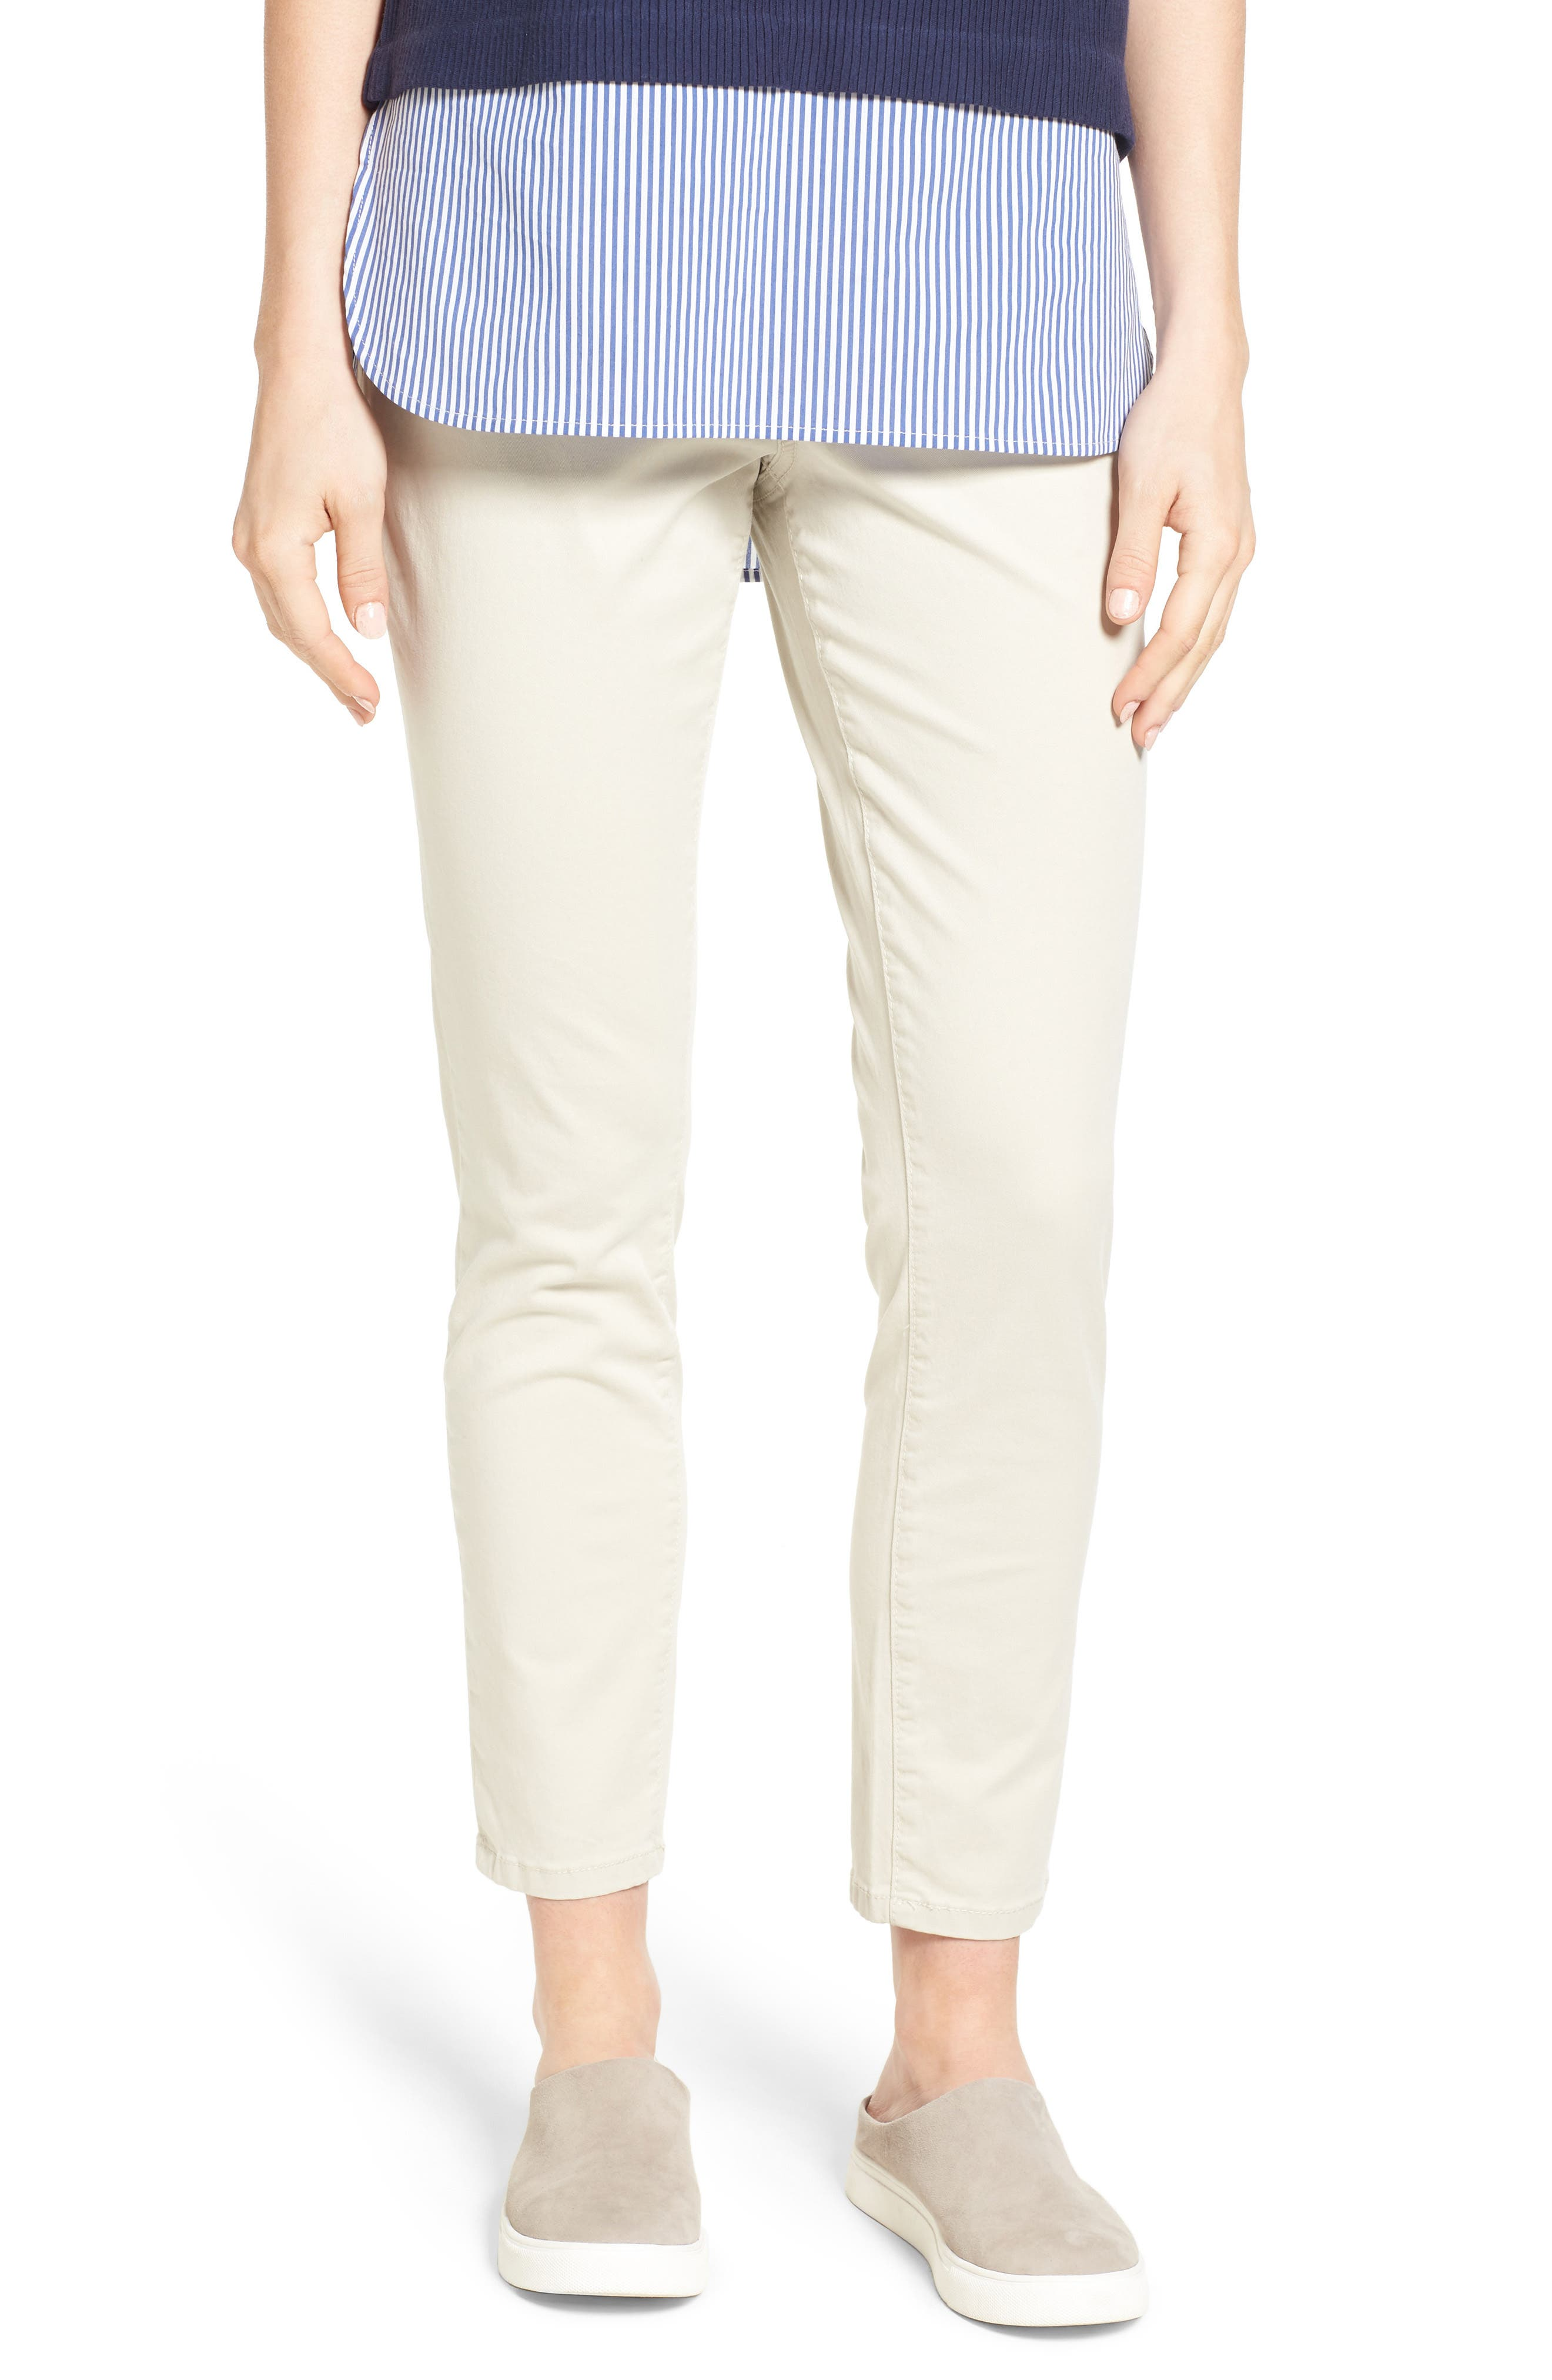 Jag Jeans Amelia Pull-On Slim Stretch Twill Ankle Pants (Regular & Petite)